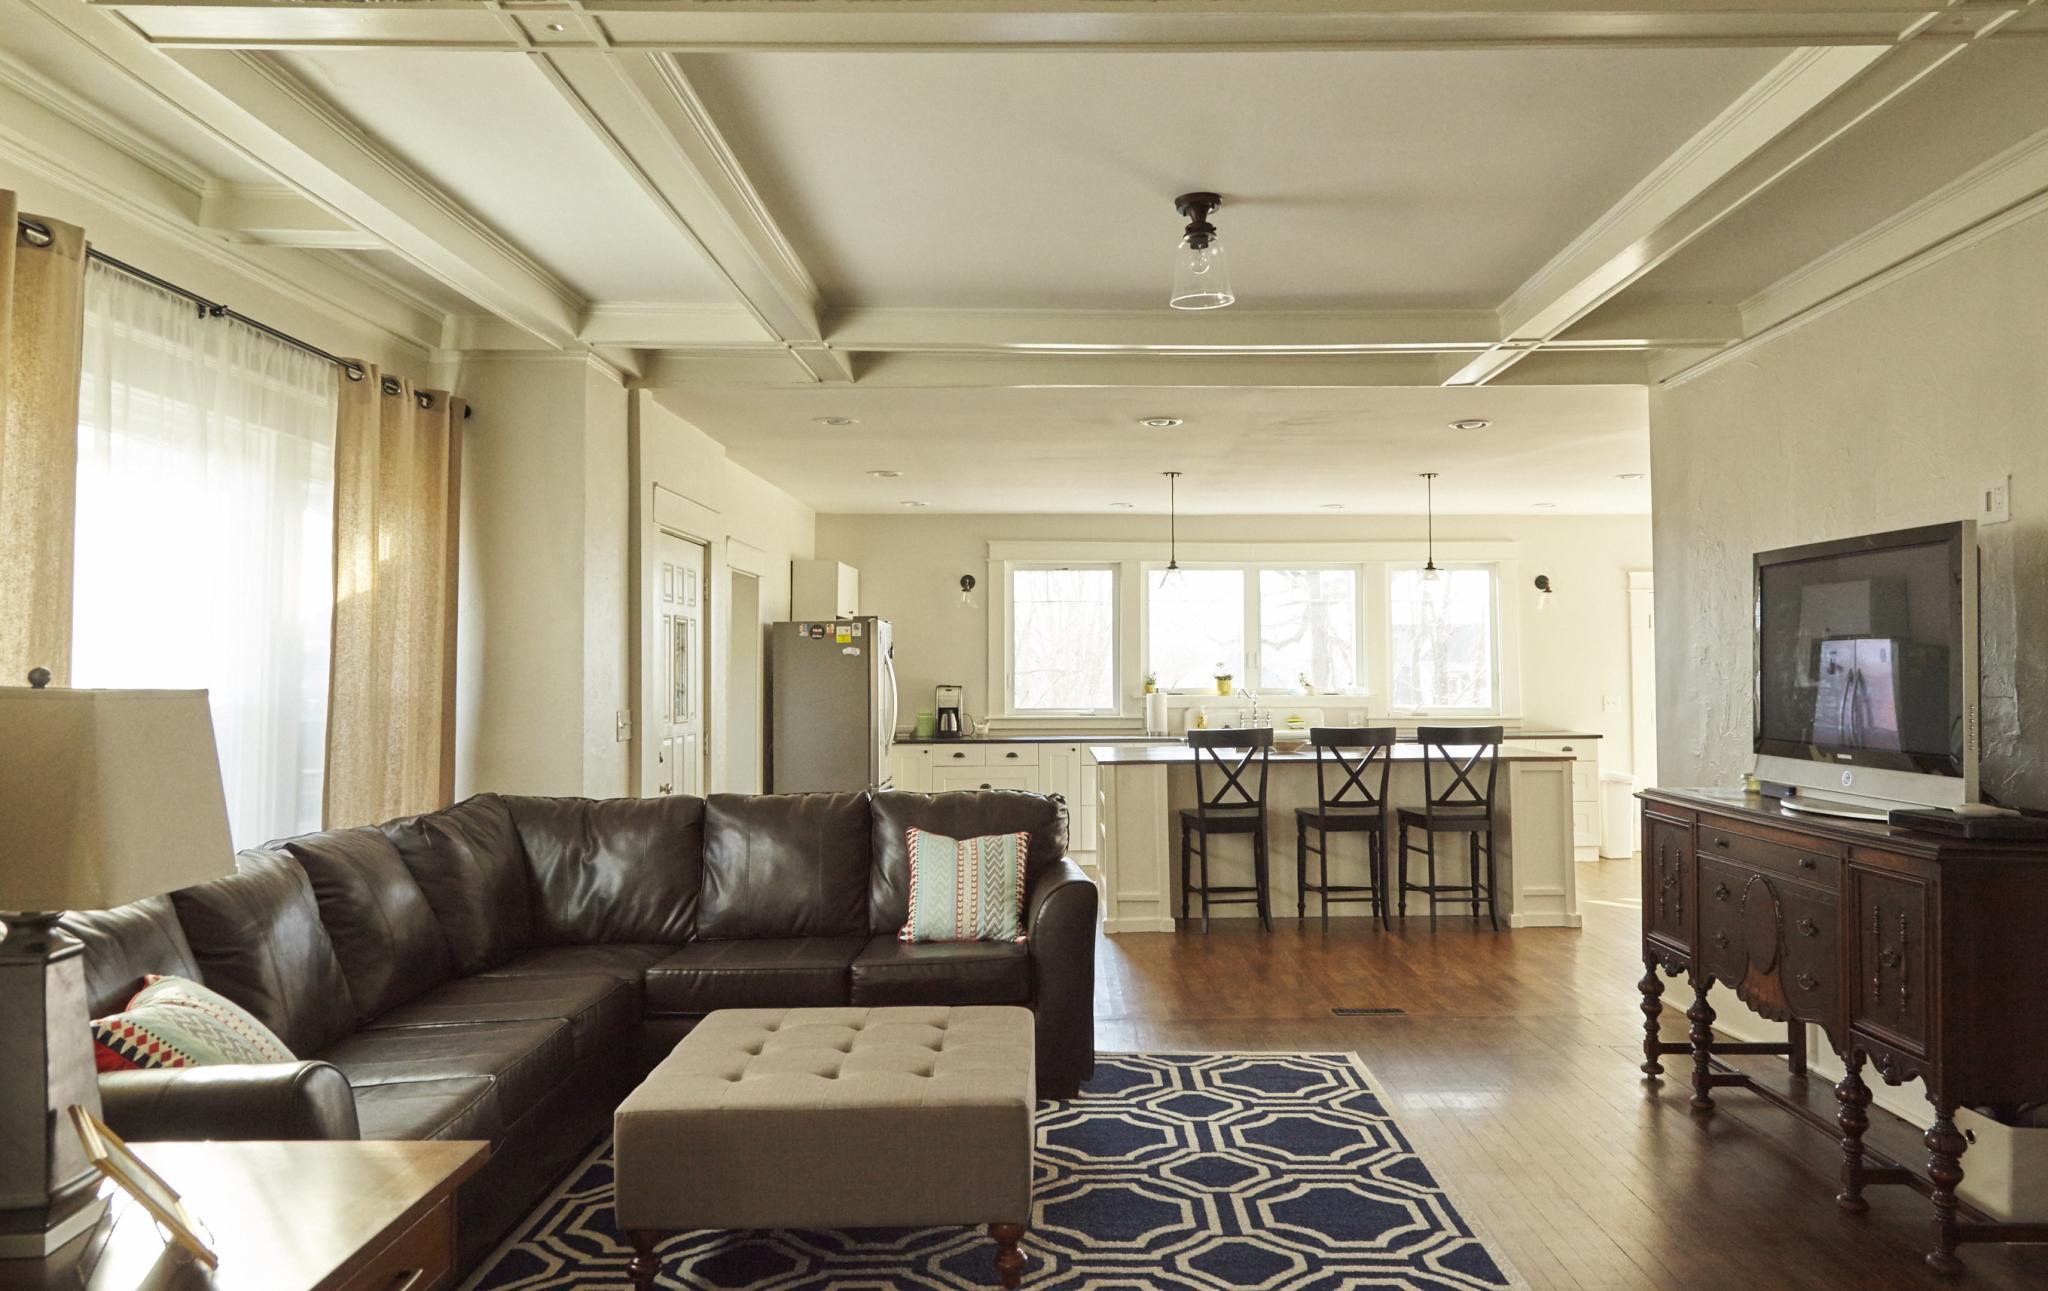 340 Garfield Ave For Rent - Kansas City, MO   Trulia